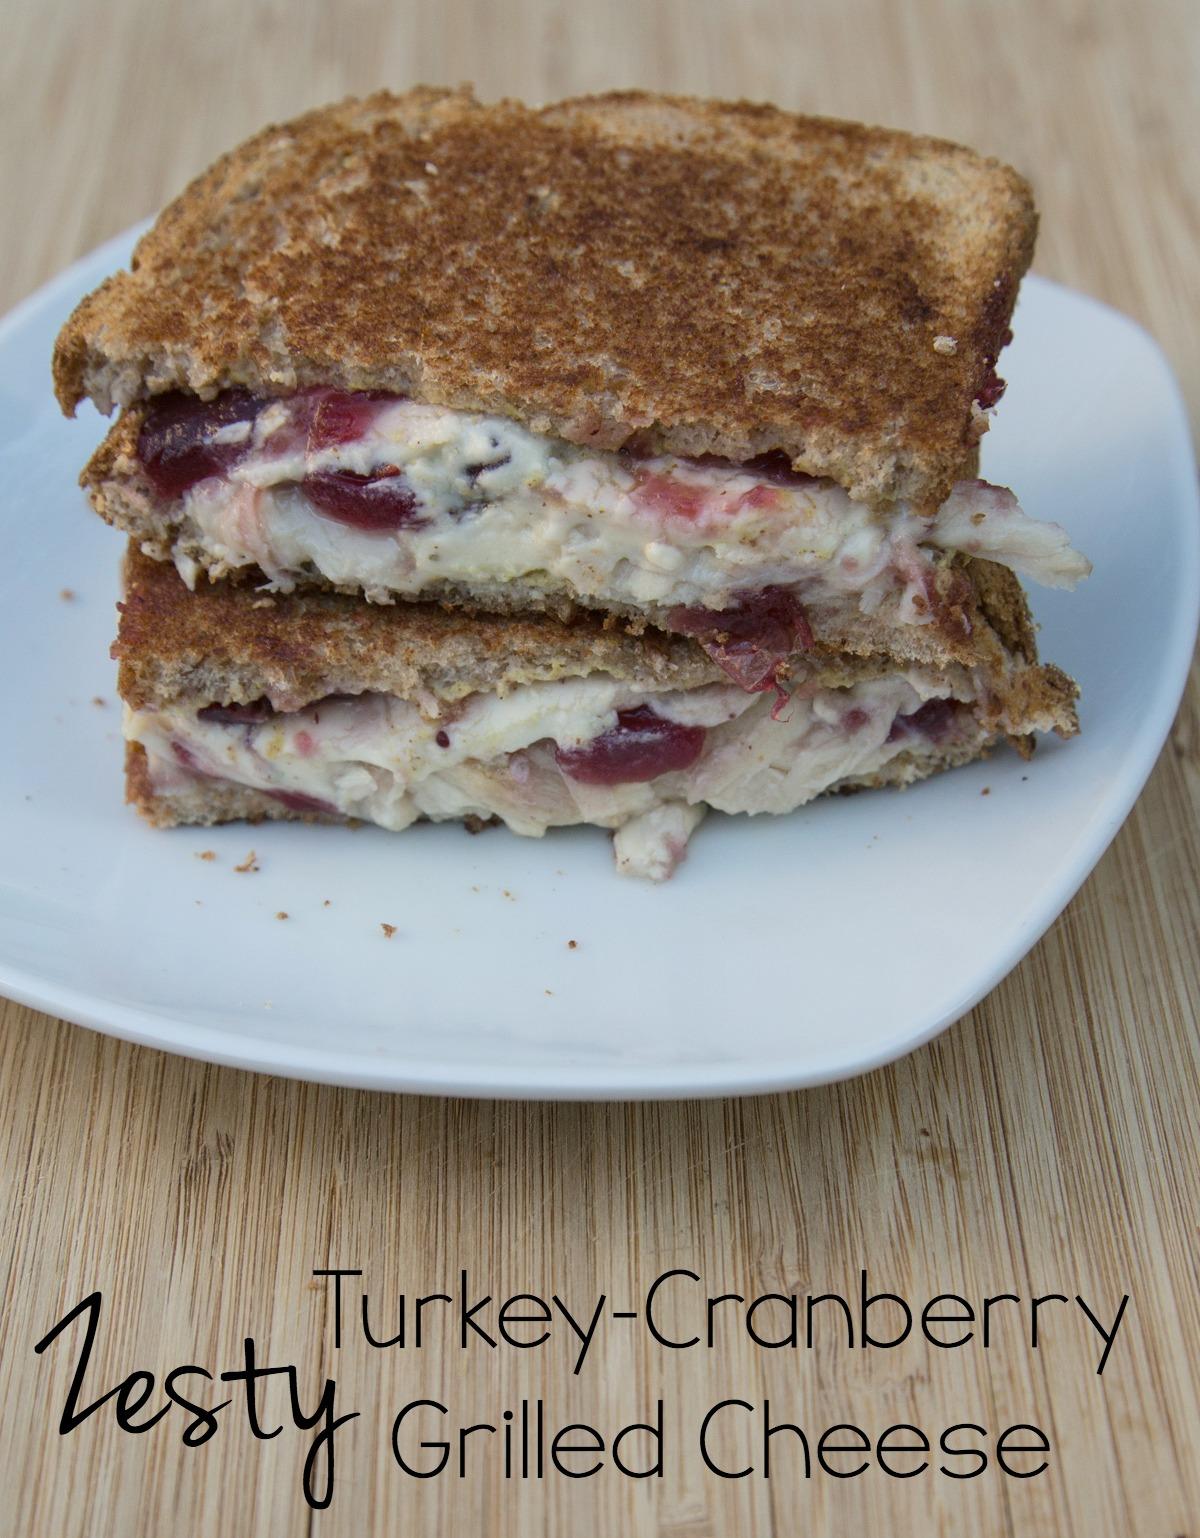 zesty-turkey-cranberry-grilled-cheese-on-5dollardinners-com